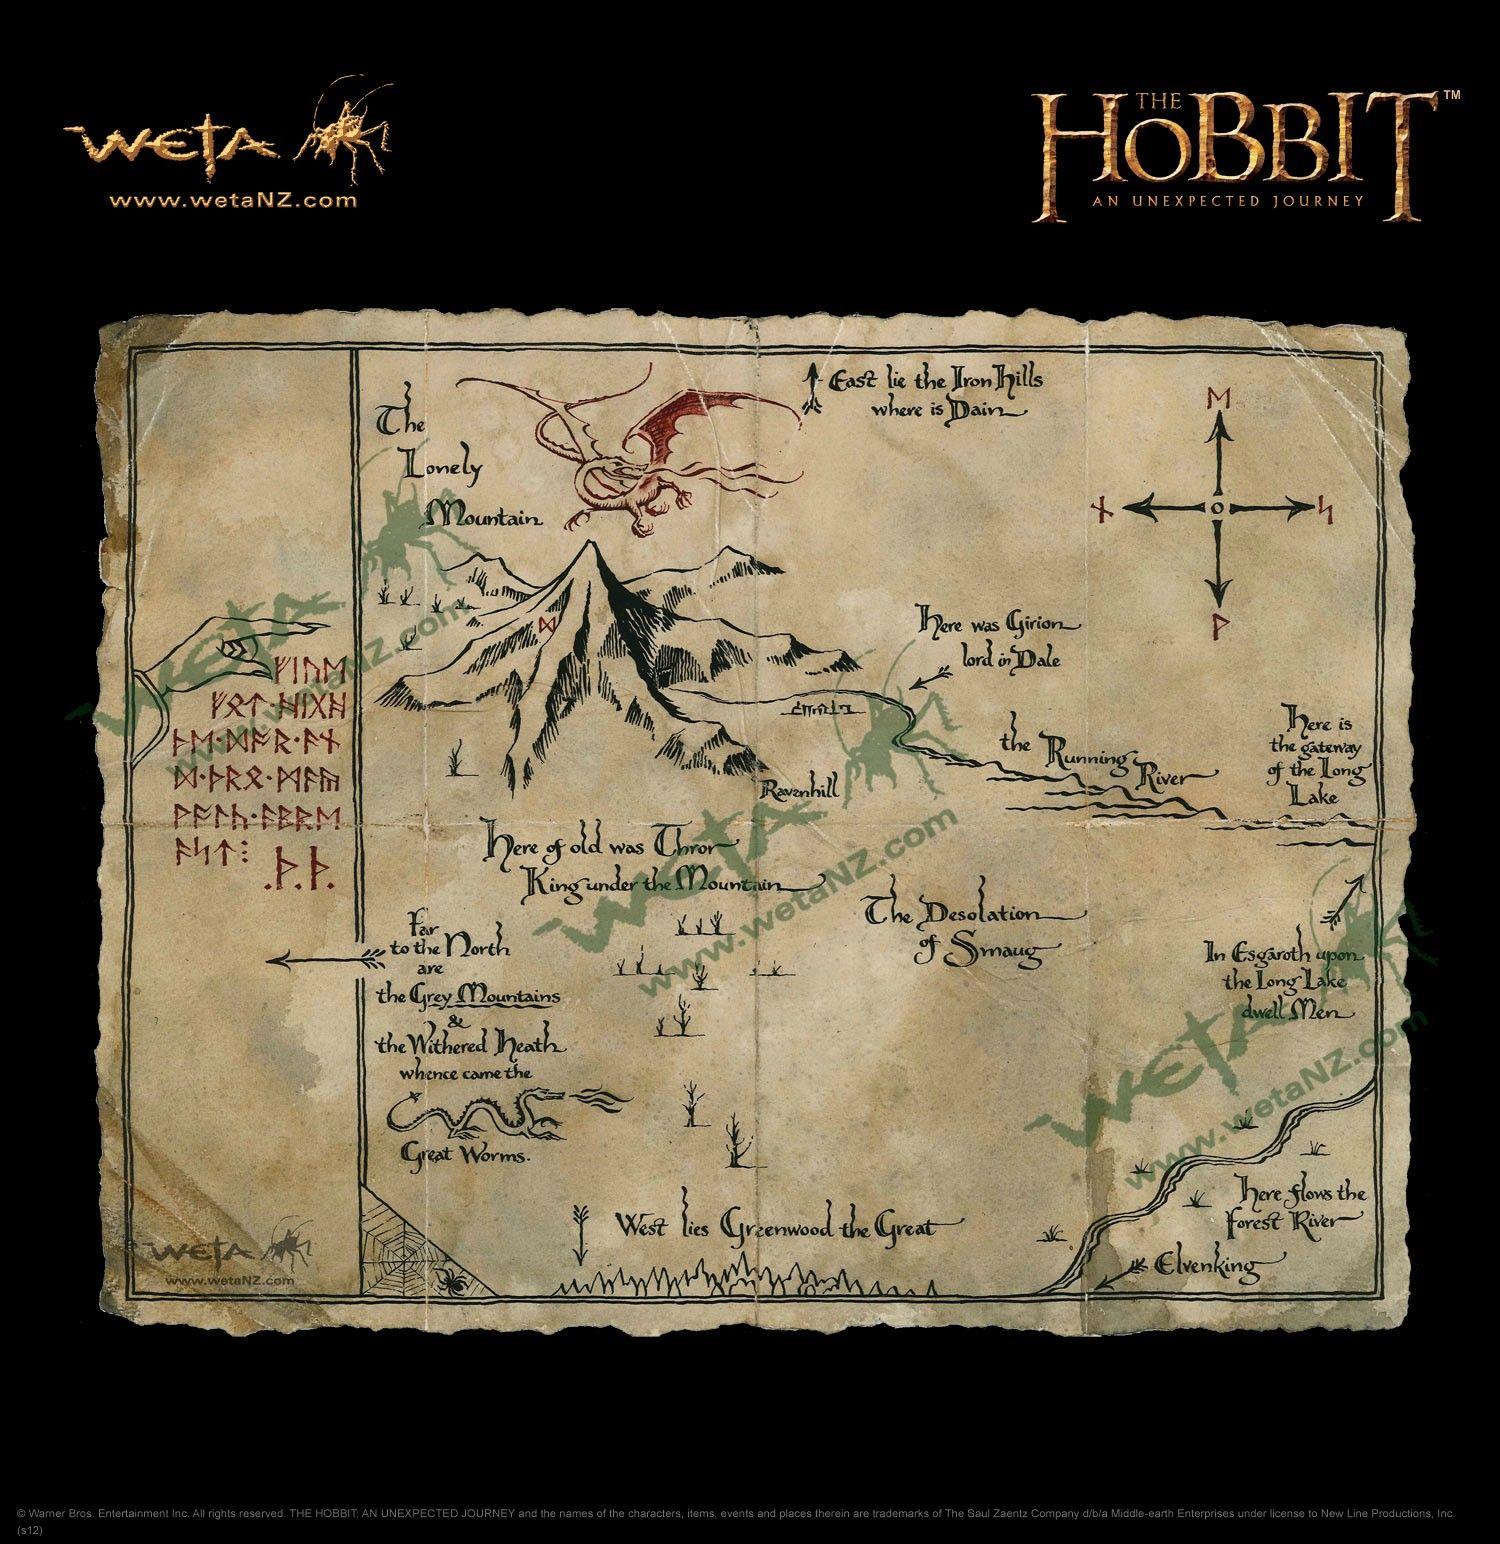 Hobbit Tech Science And Culture News Photos Videos